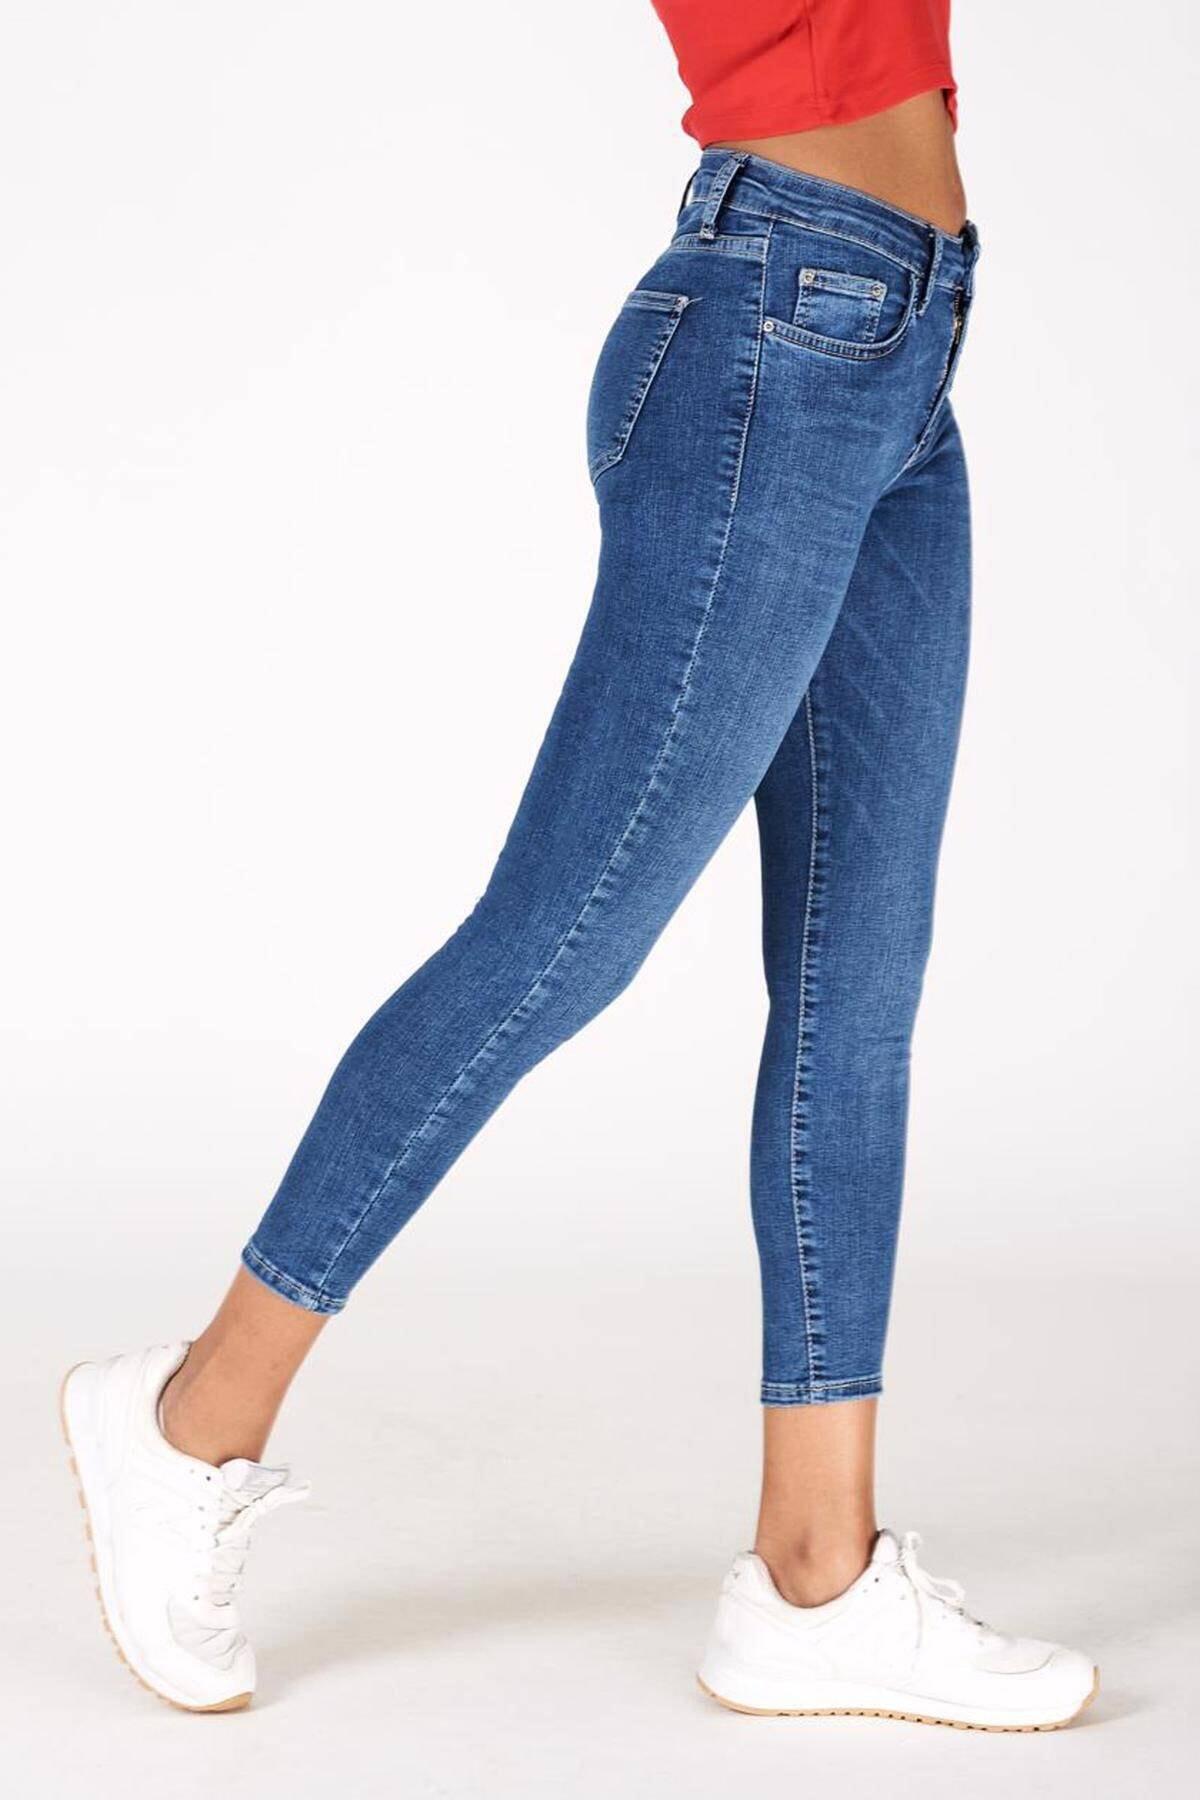 Addax Kadın Kot Rengi Orta Bel Pantolon Pn5799 - Pnr ADX-0000016979 2